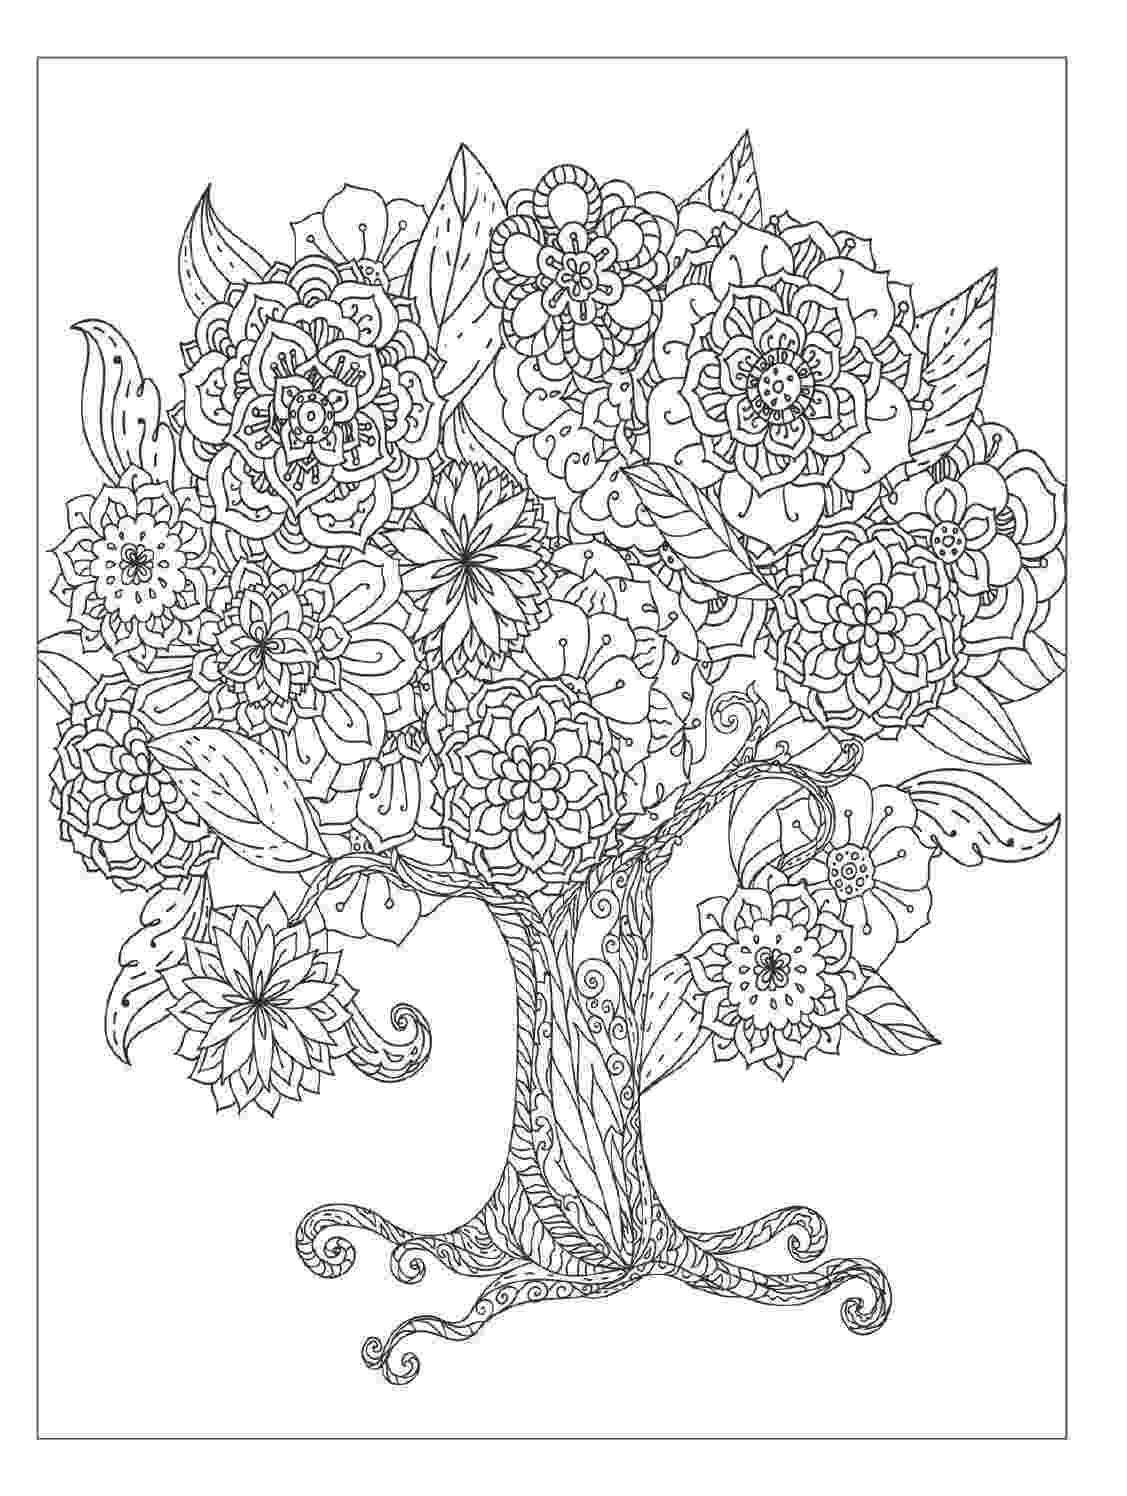 floral designs coloring book beautiful flowers detailed floral designs coloring book coloring floral designs book 1 1